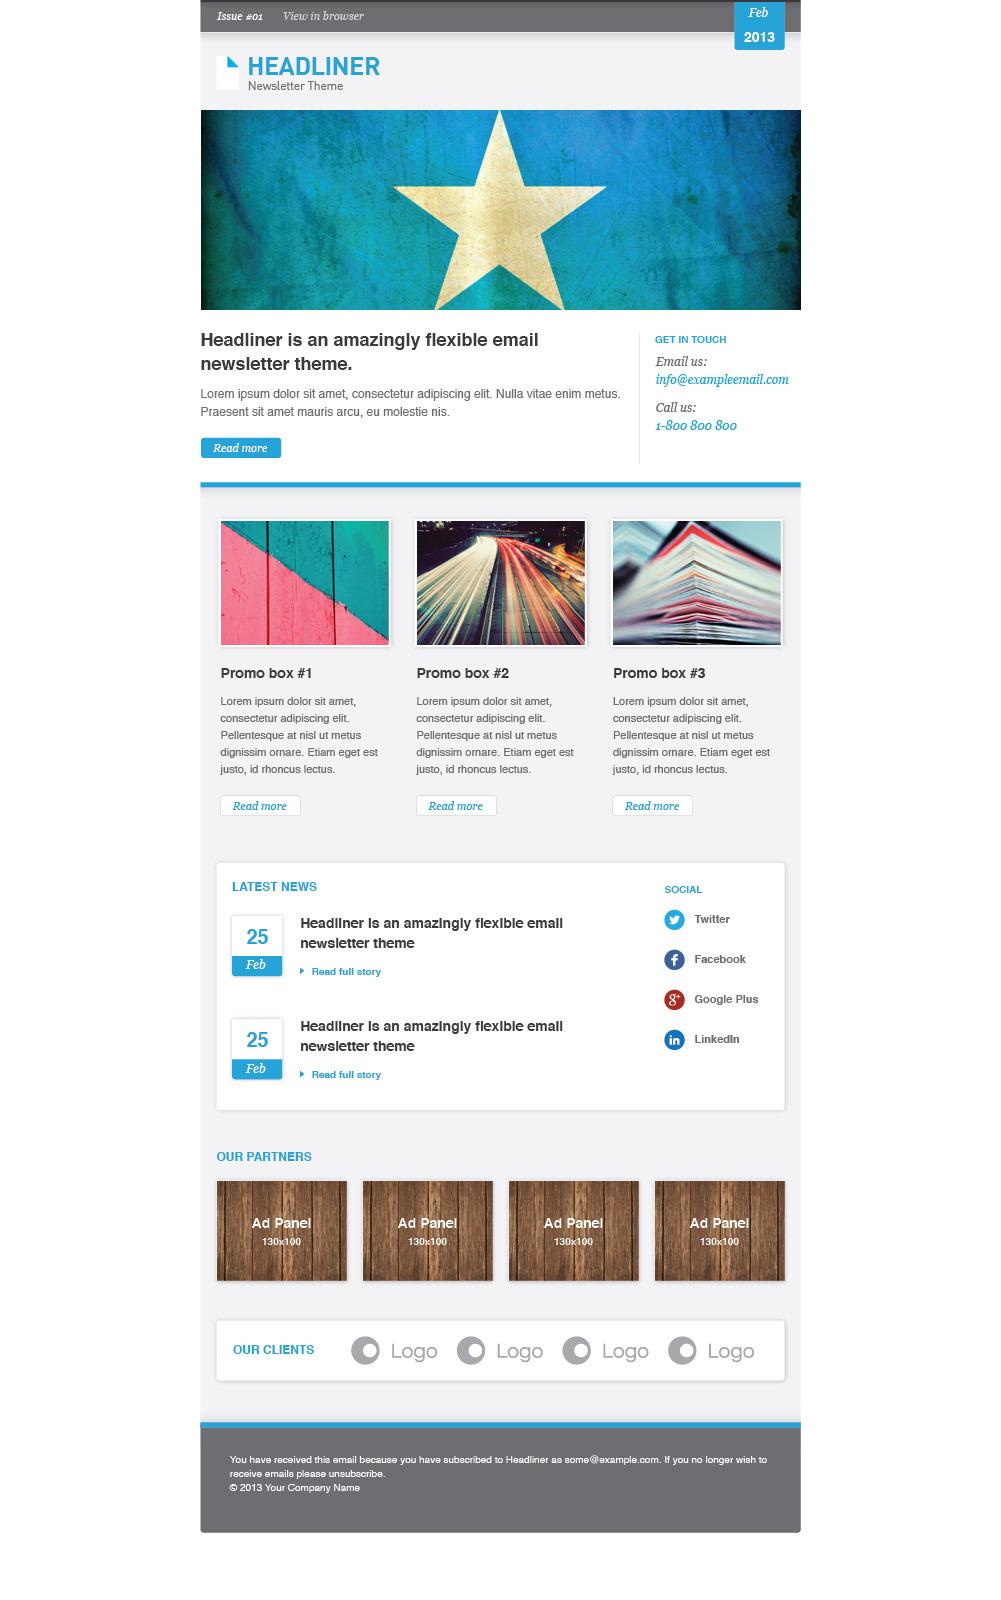 headliner email marketing newsletter template by. Black Bedroom Furniture Sets. Home Design Ideas